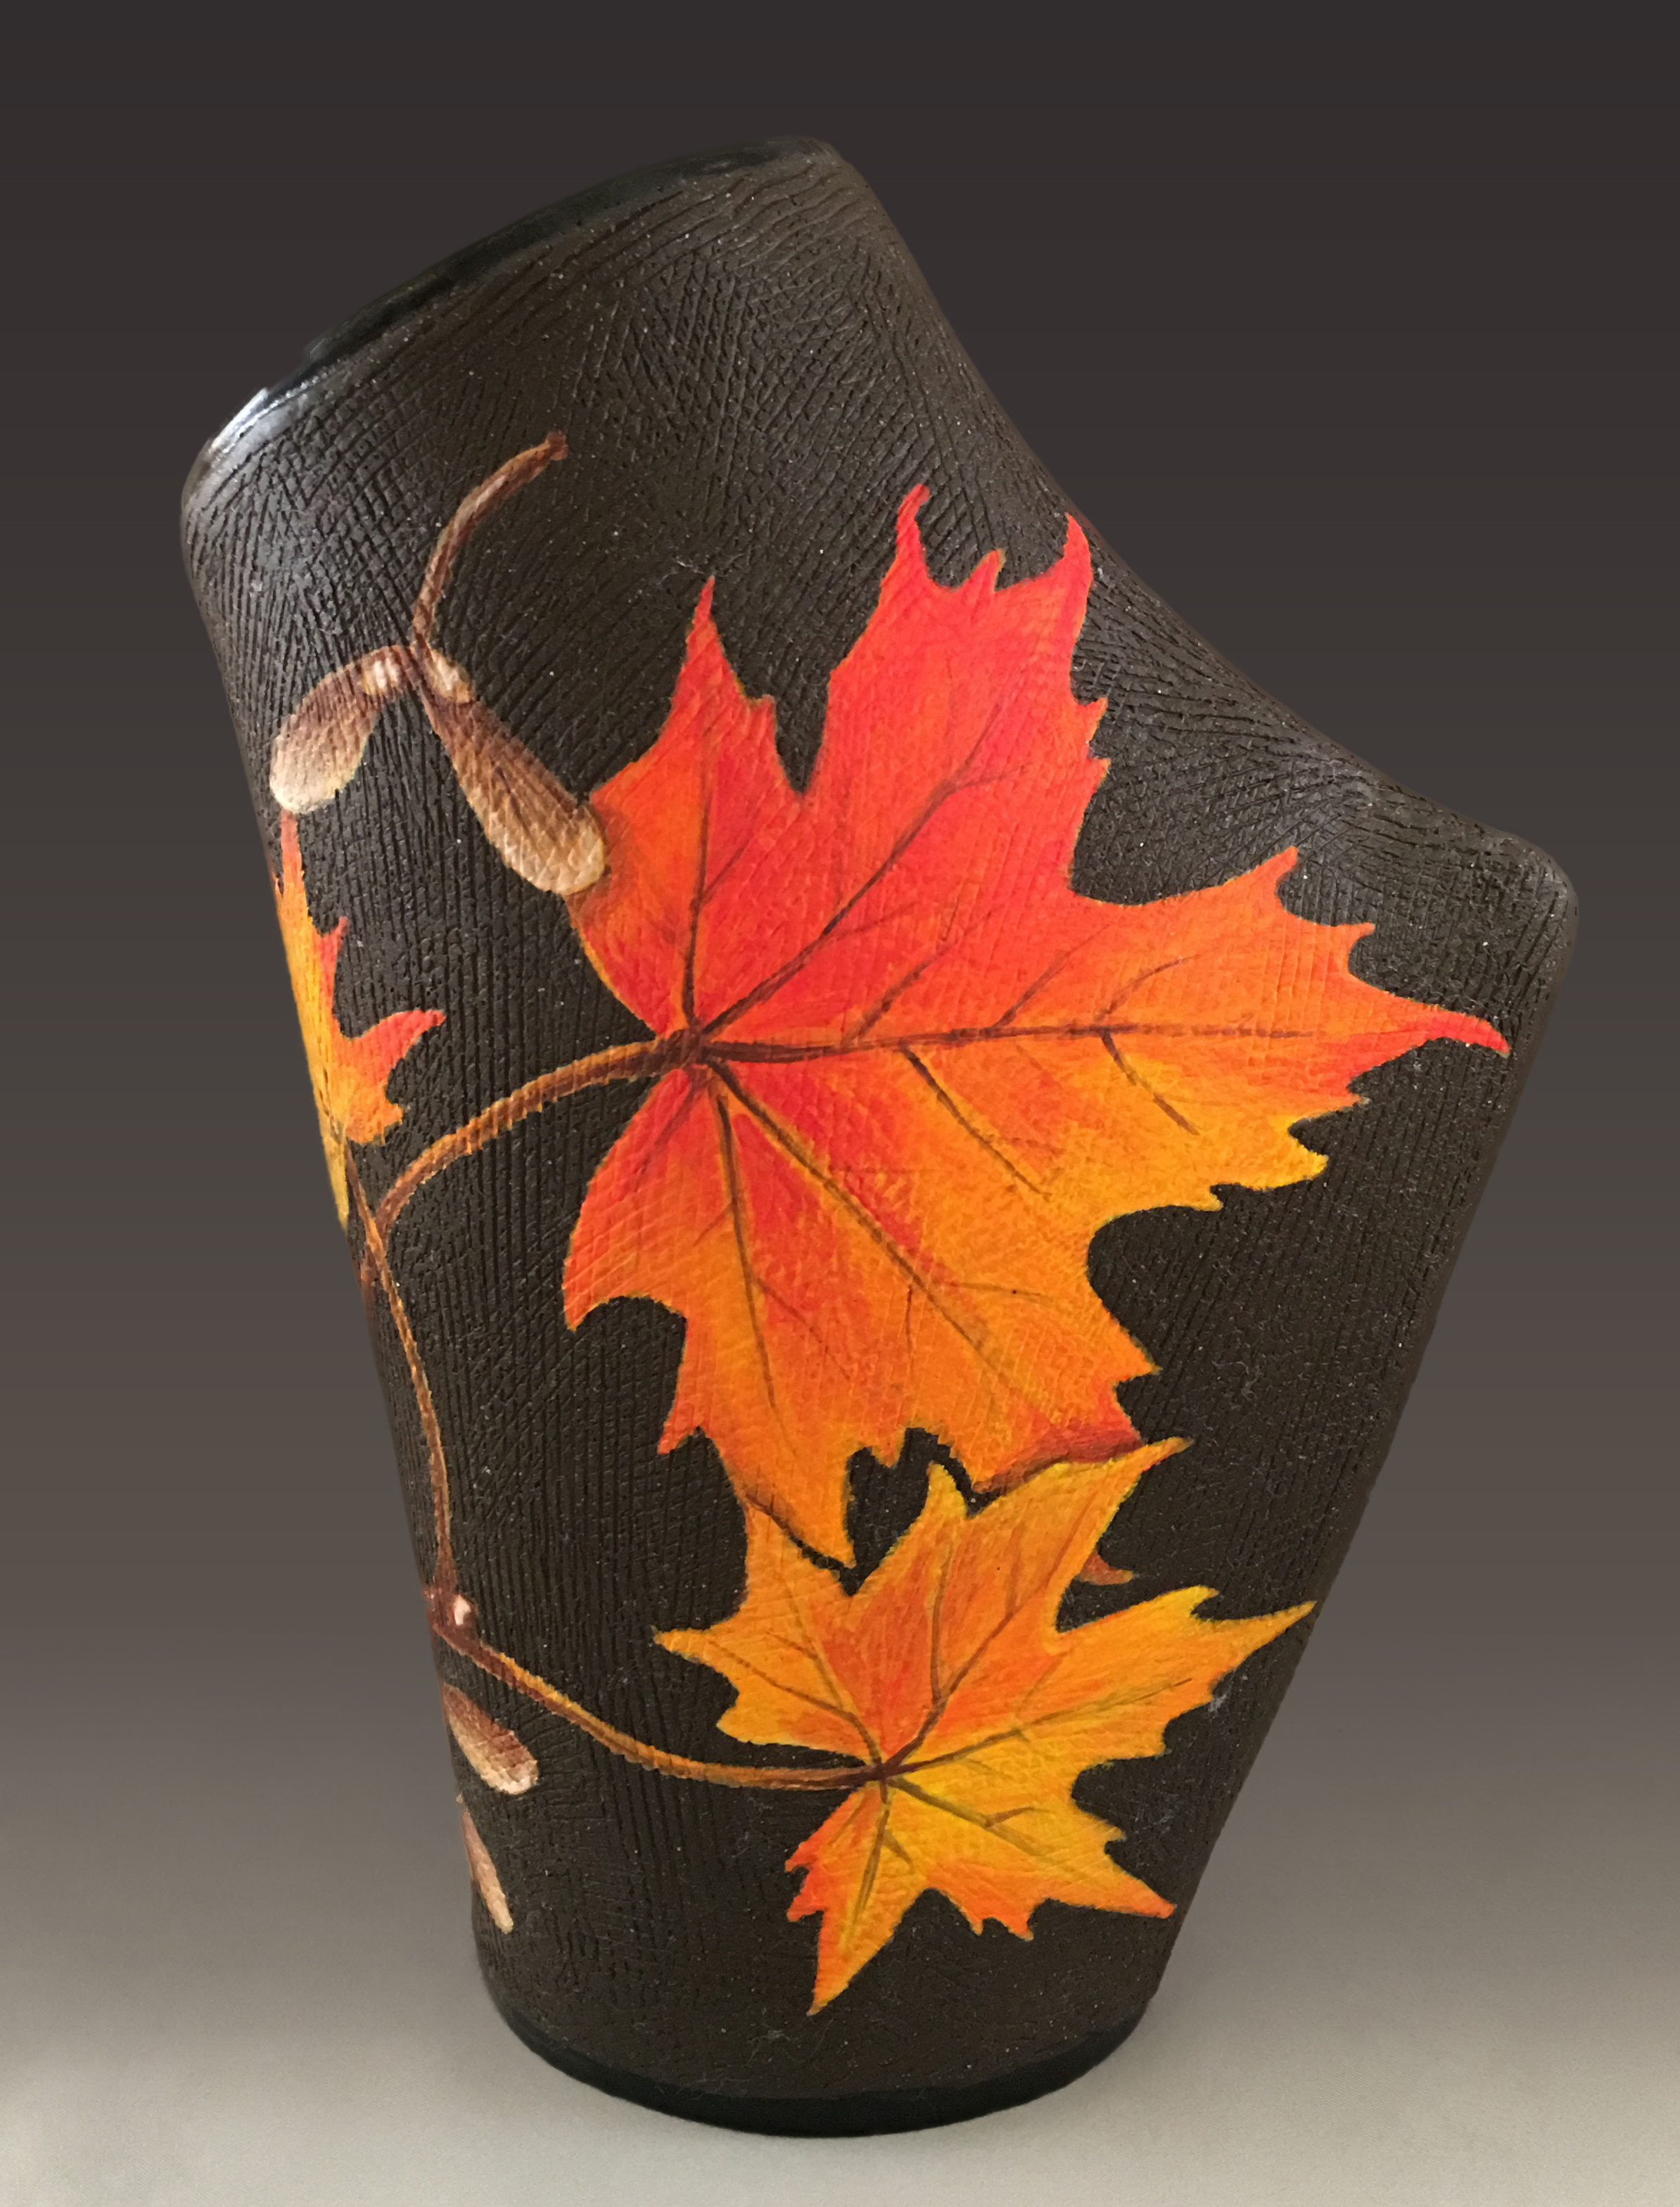 HONORABLE MENTION  - Marina Smelik | Flaming Maples | Ceramics